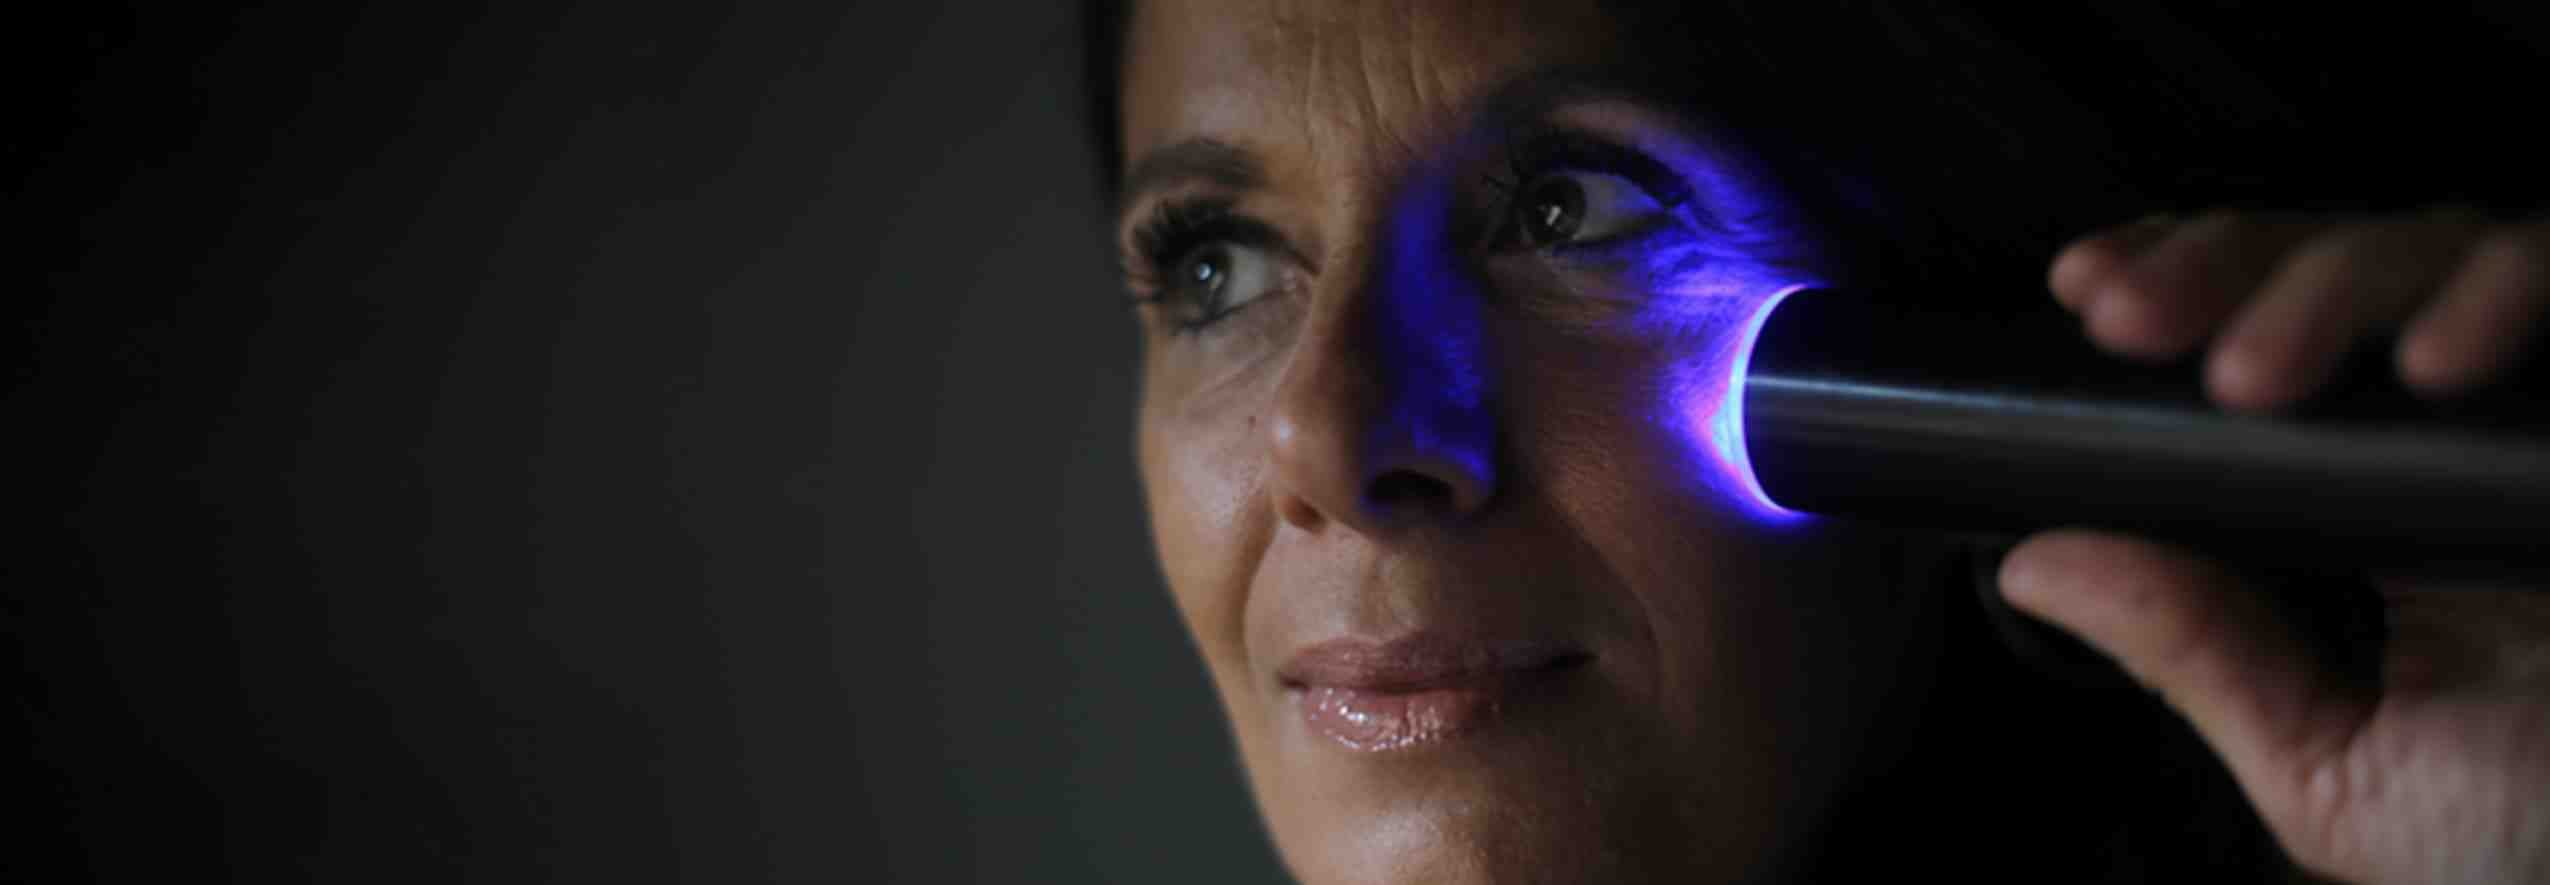 LYMA laser treats sagging eyelids